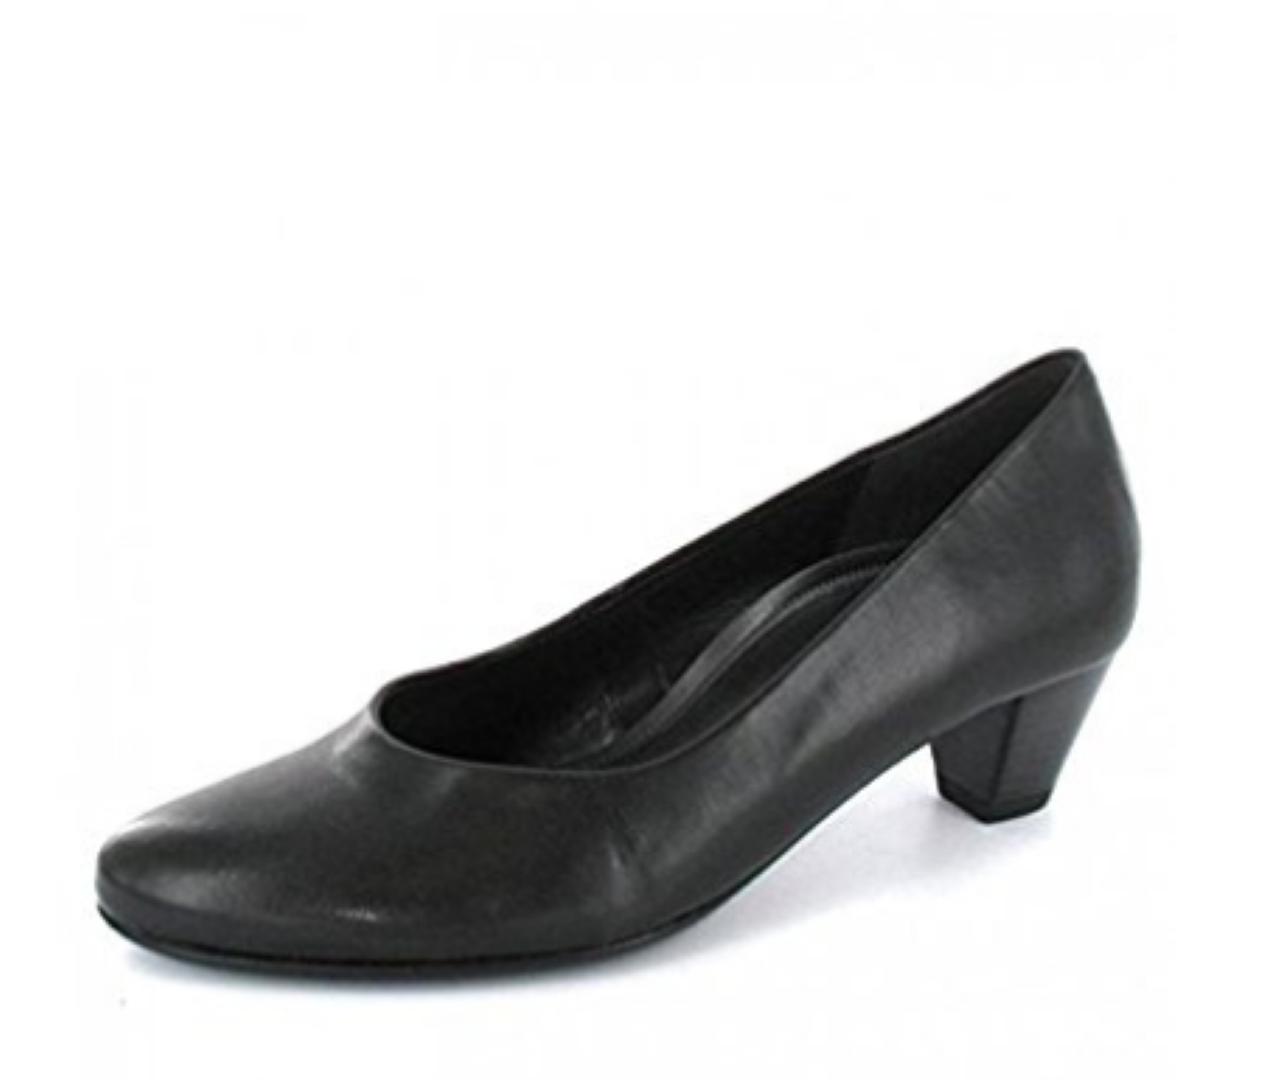 Gabor Women's Black Nappa Nappa Nappa H.T. Court shoes's Size UK 6 EU 39 NH08 14 SALEx f7a1a2